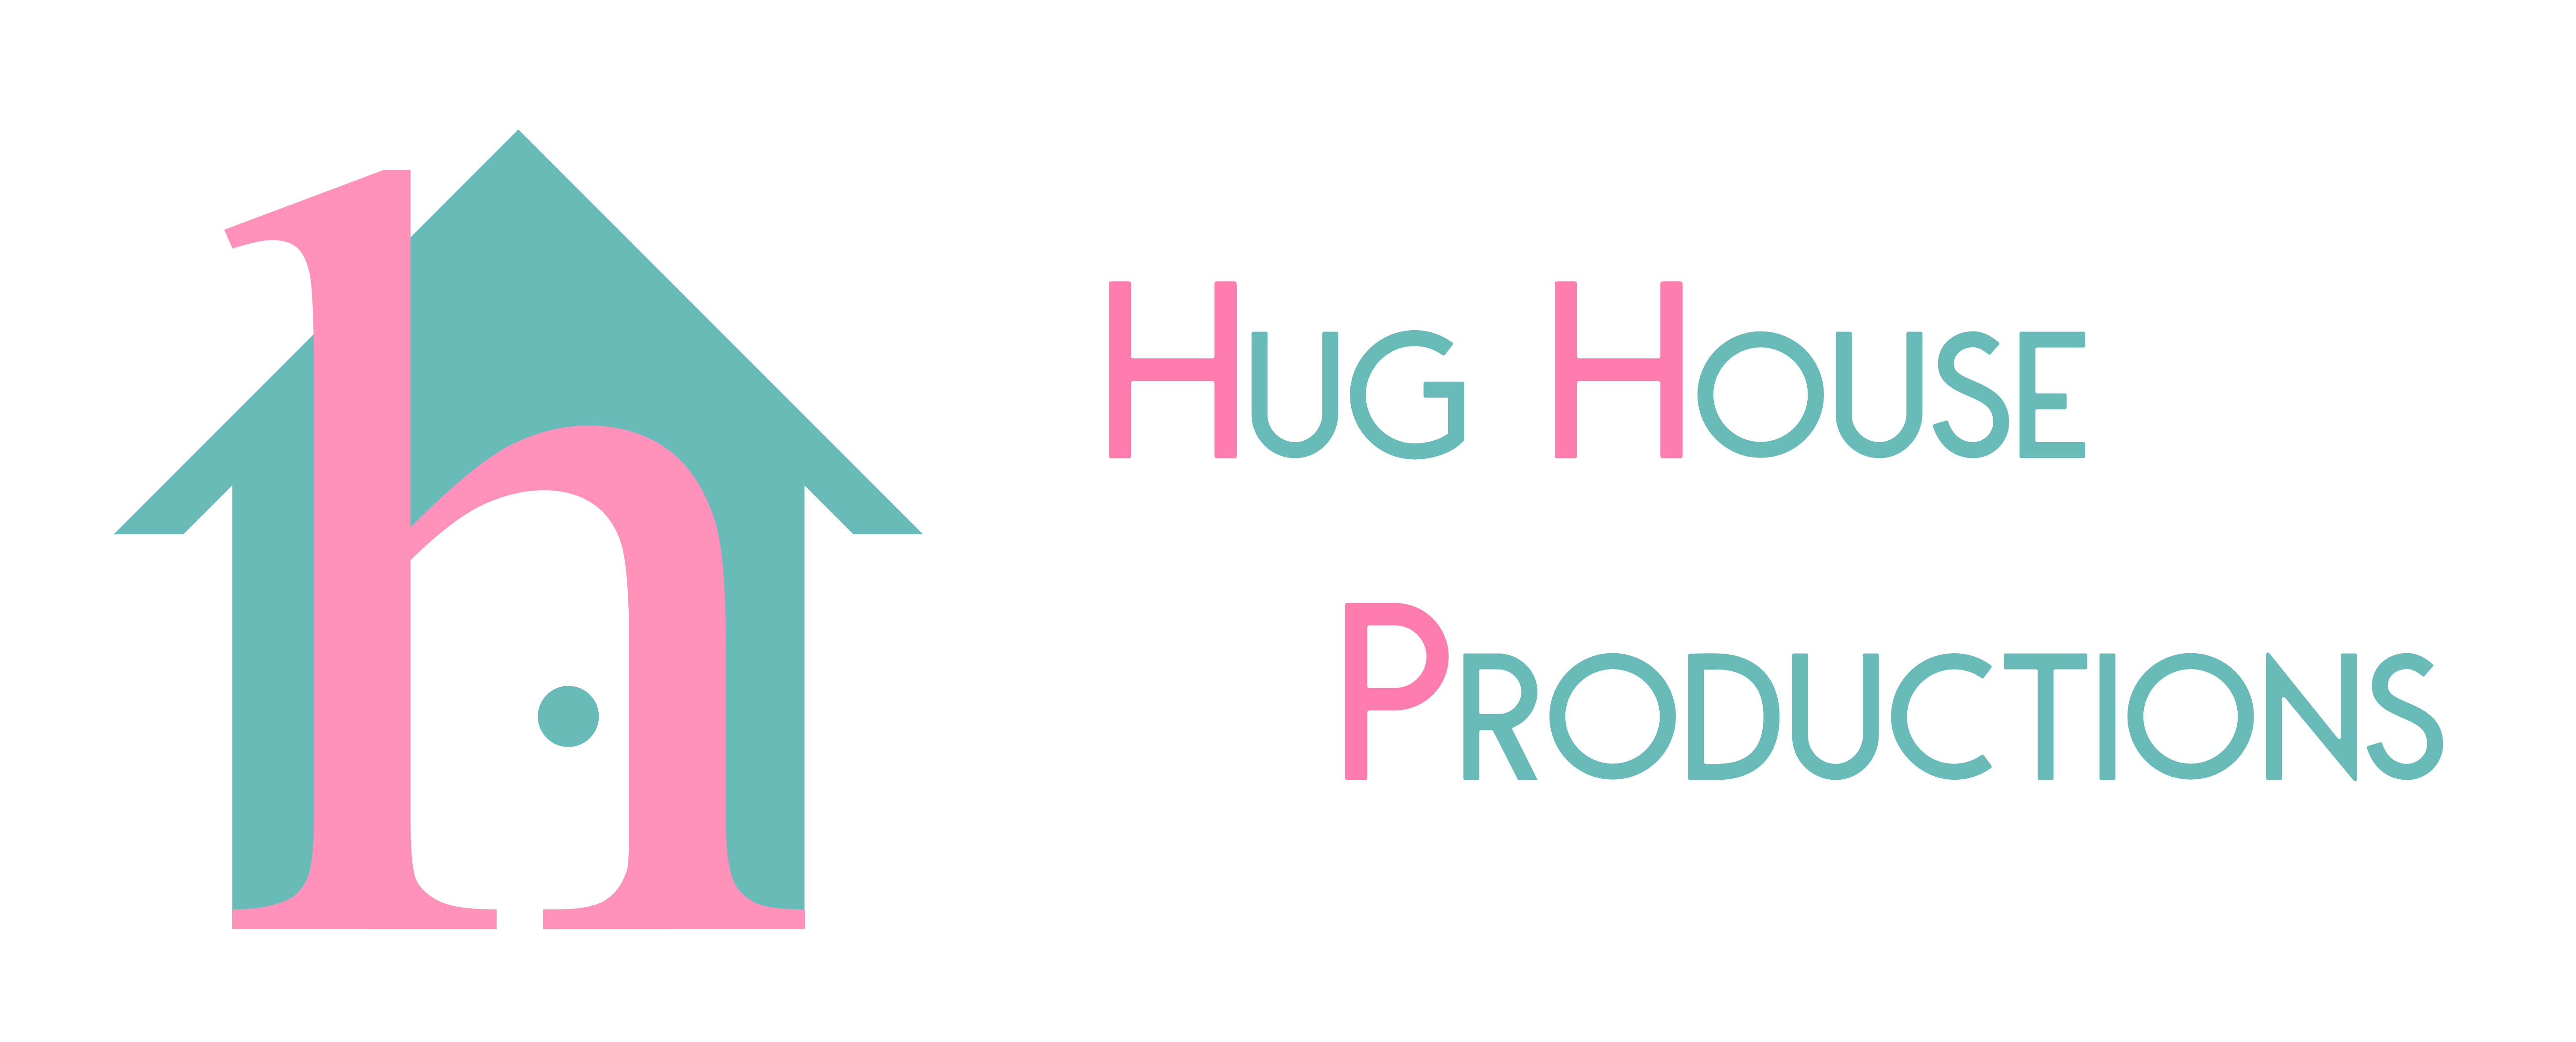 Hug House Productions